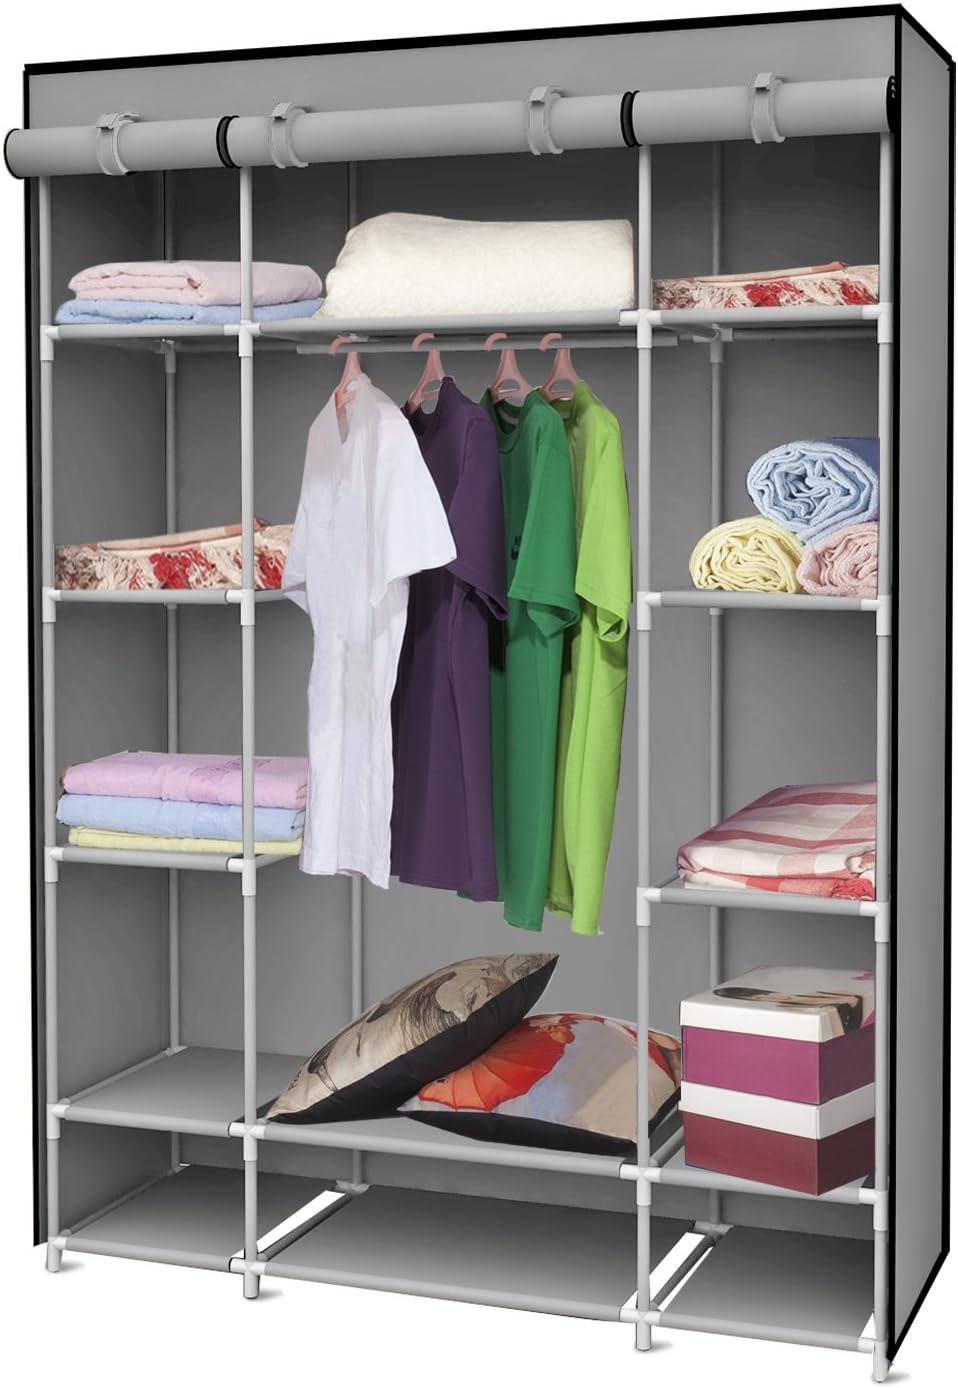 Sunbeam Storage Closet Shelving Cash Brand Cheap Sale Venue special price Grey with